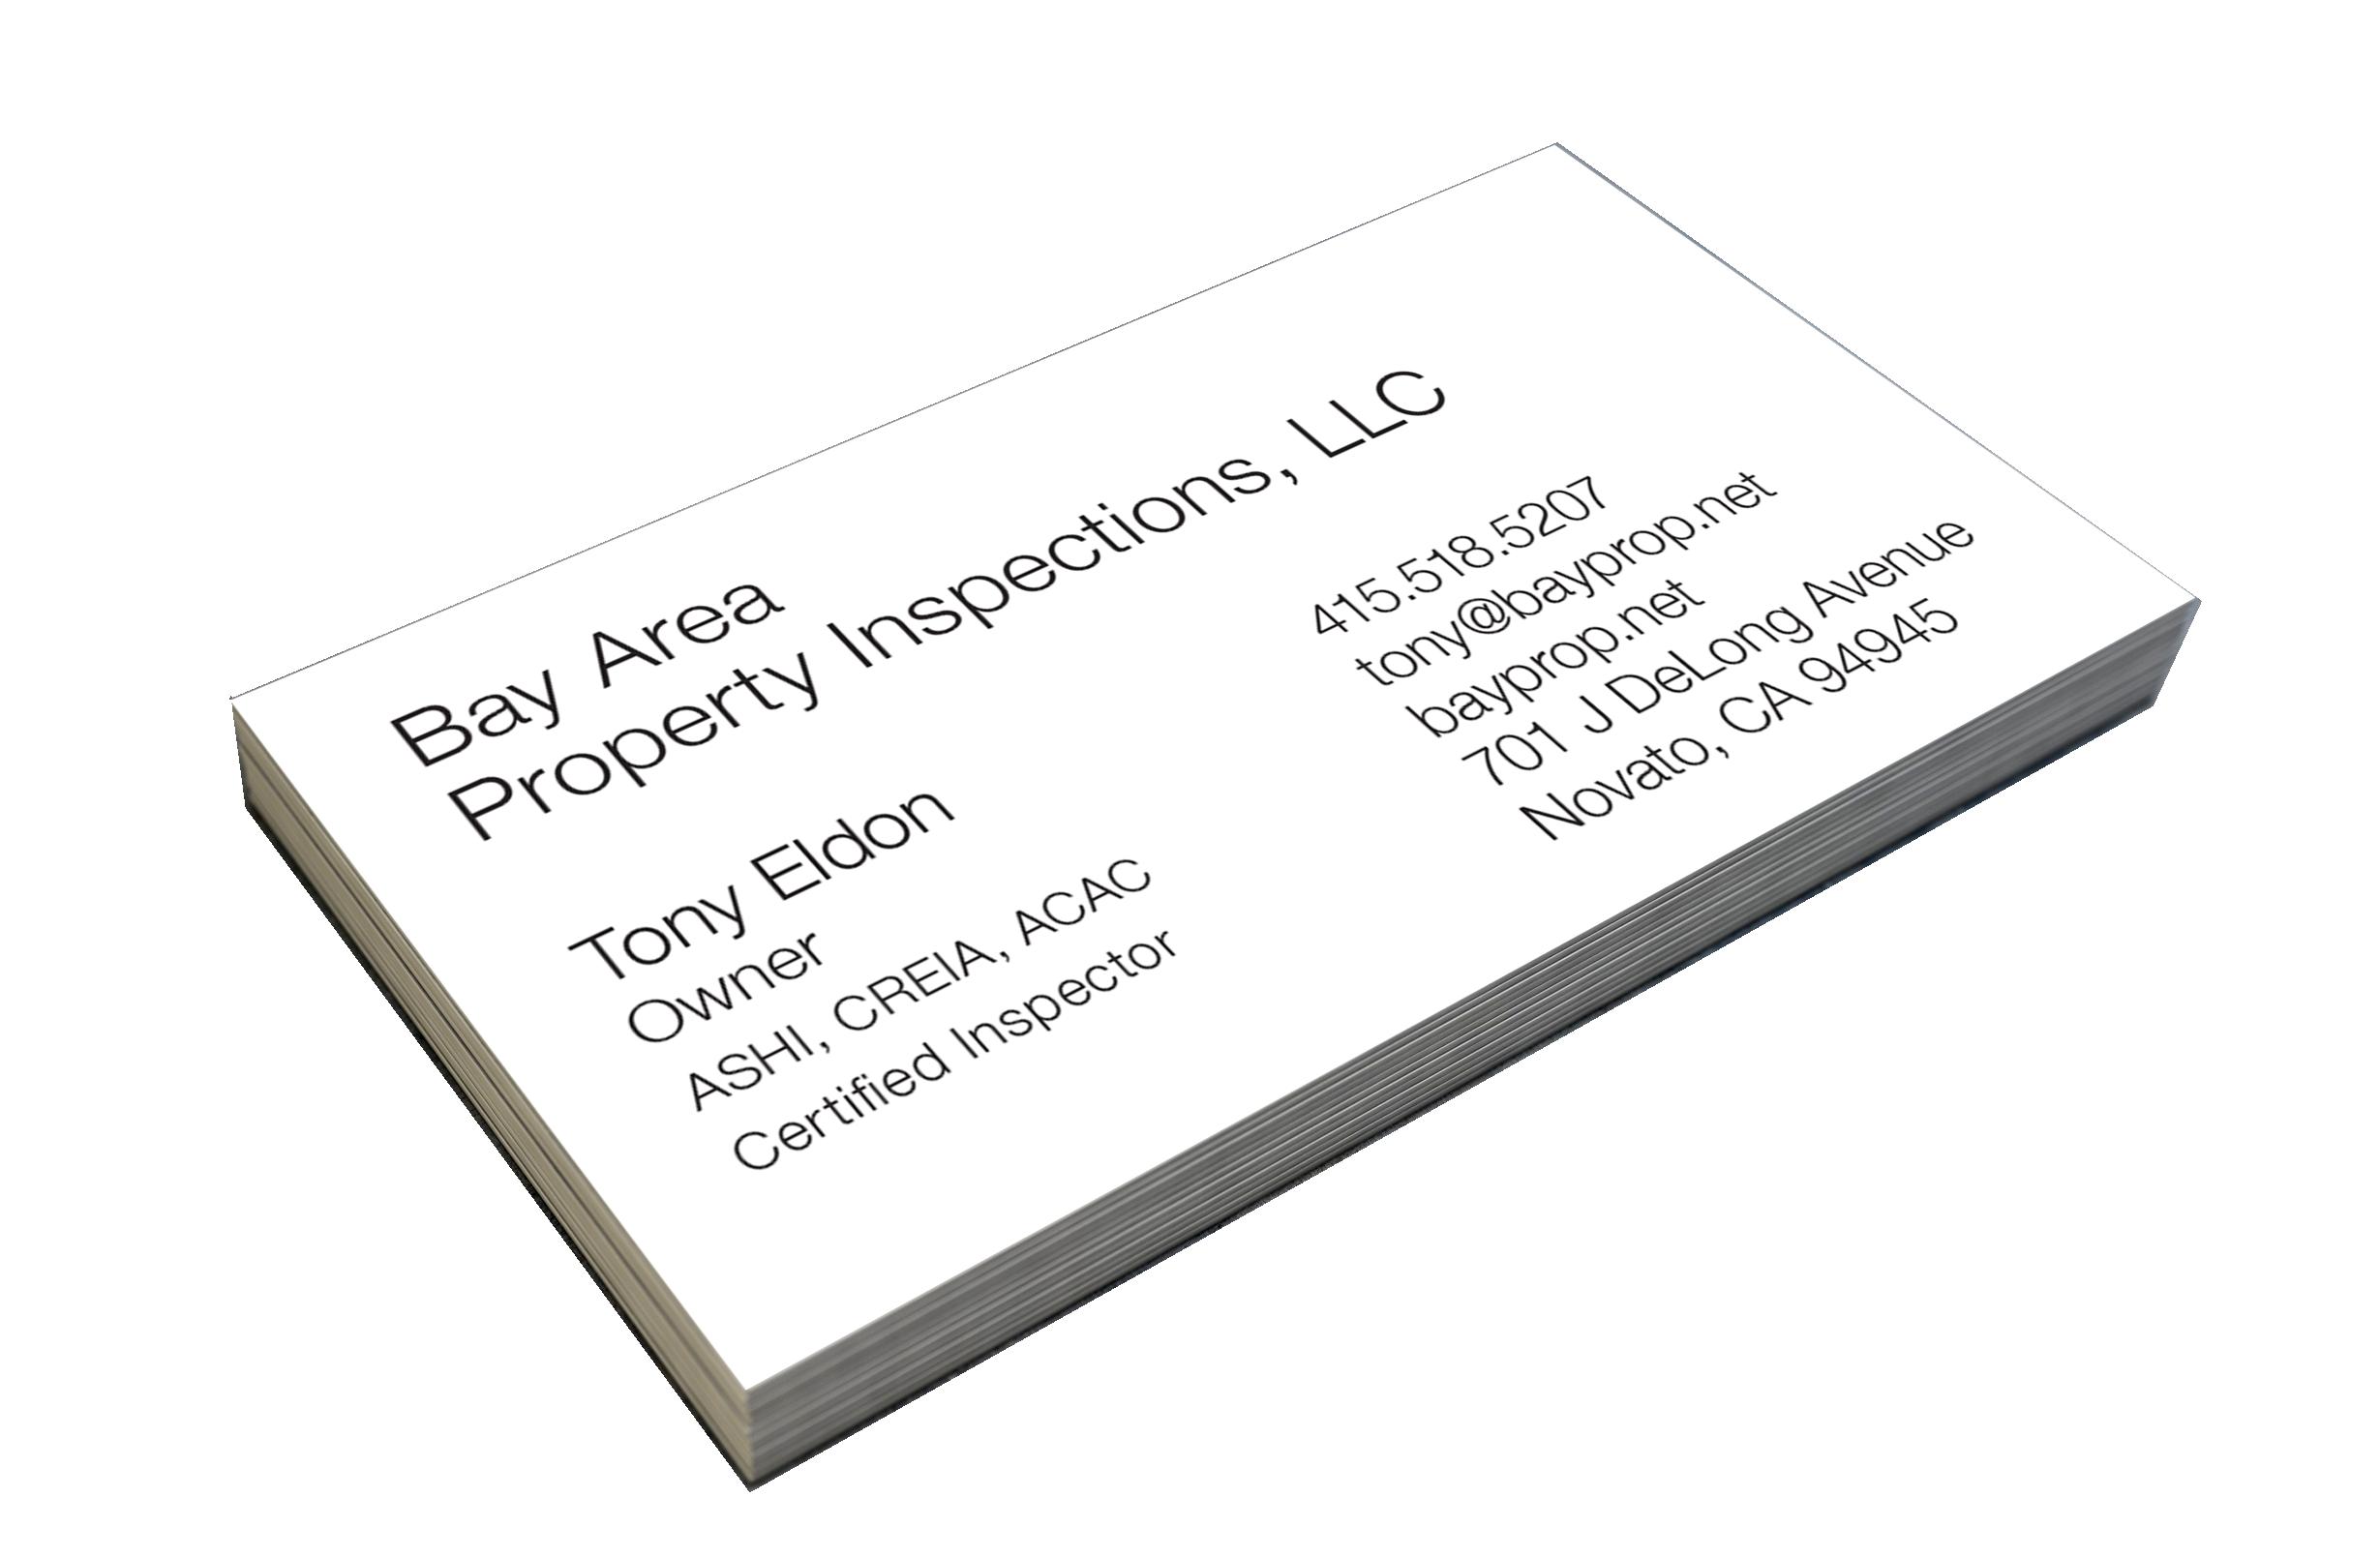 bapi business card mockup front.png